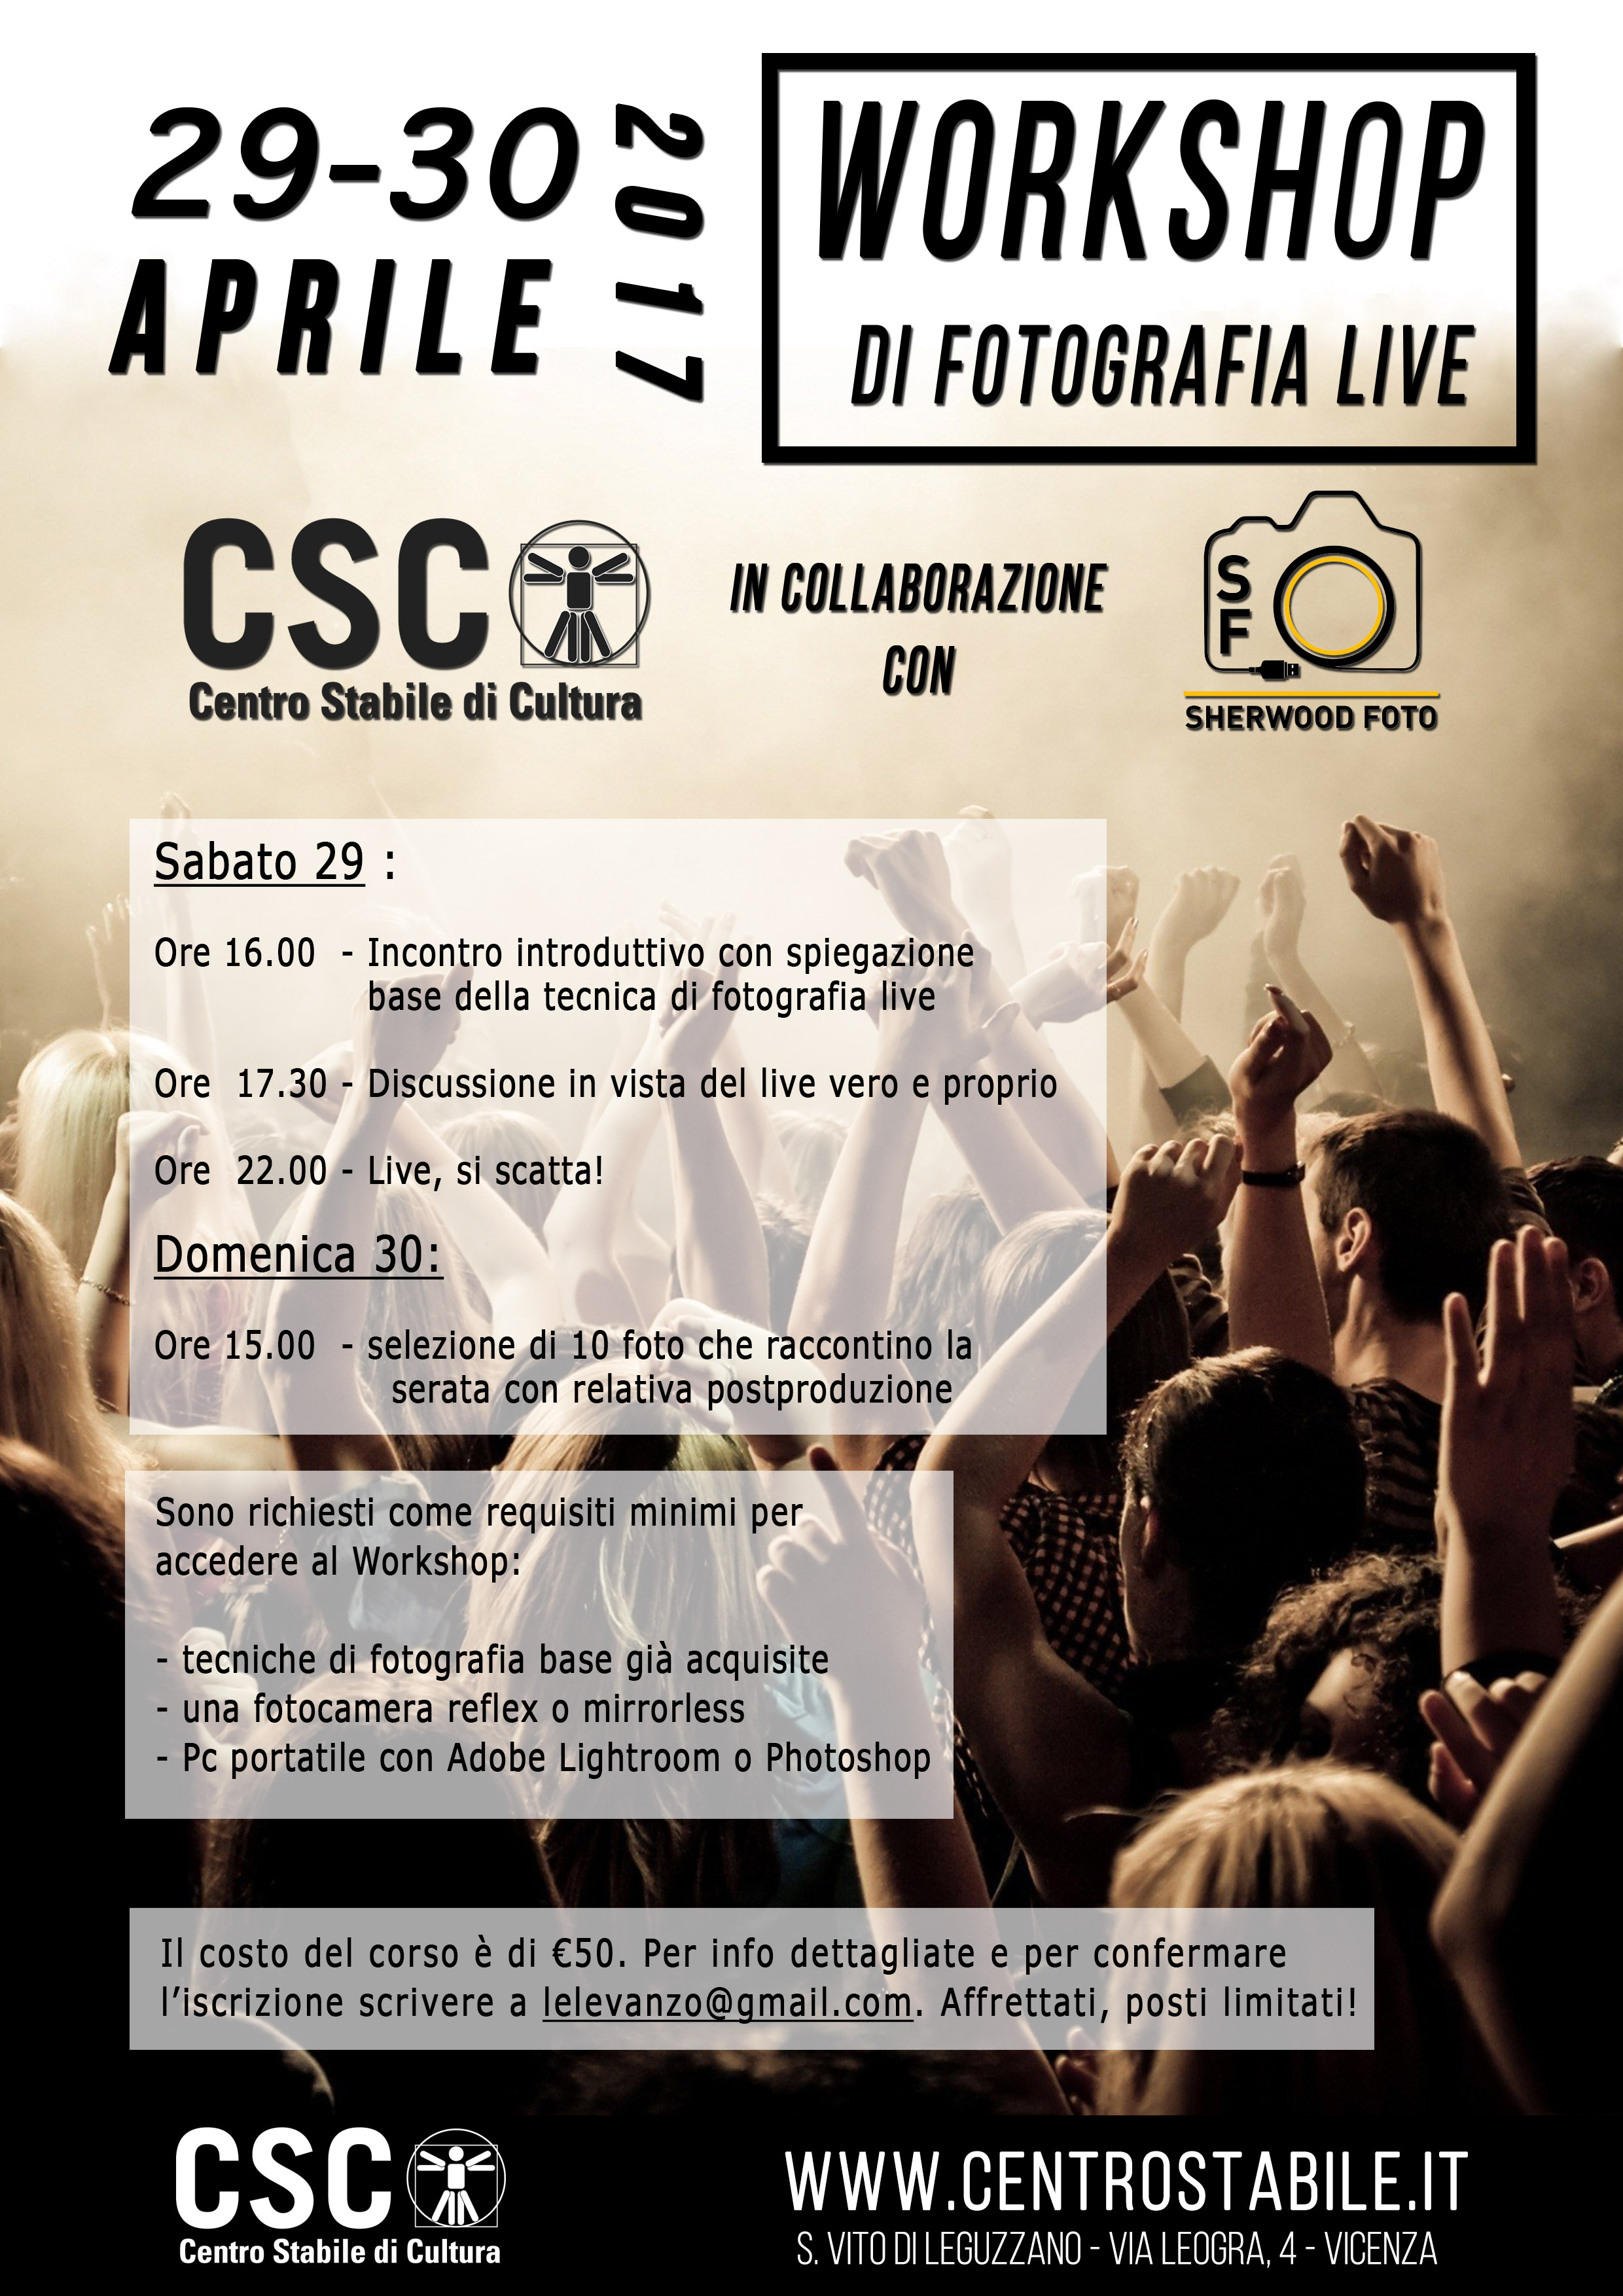 Workshop di Fotografia LIVE // 29 e 30 Aprile 2017